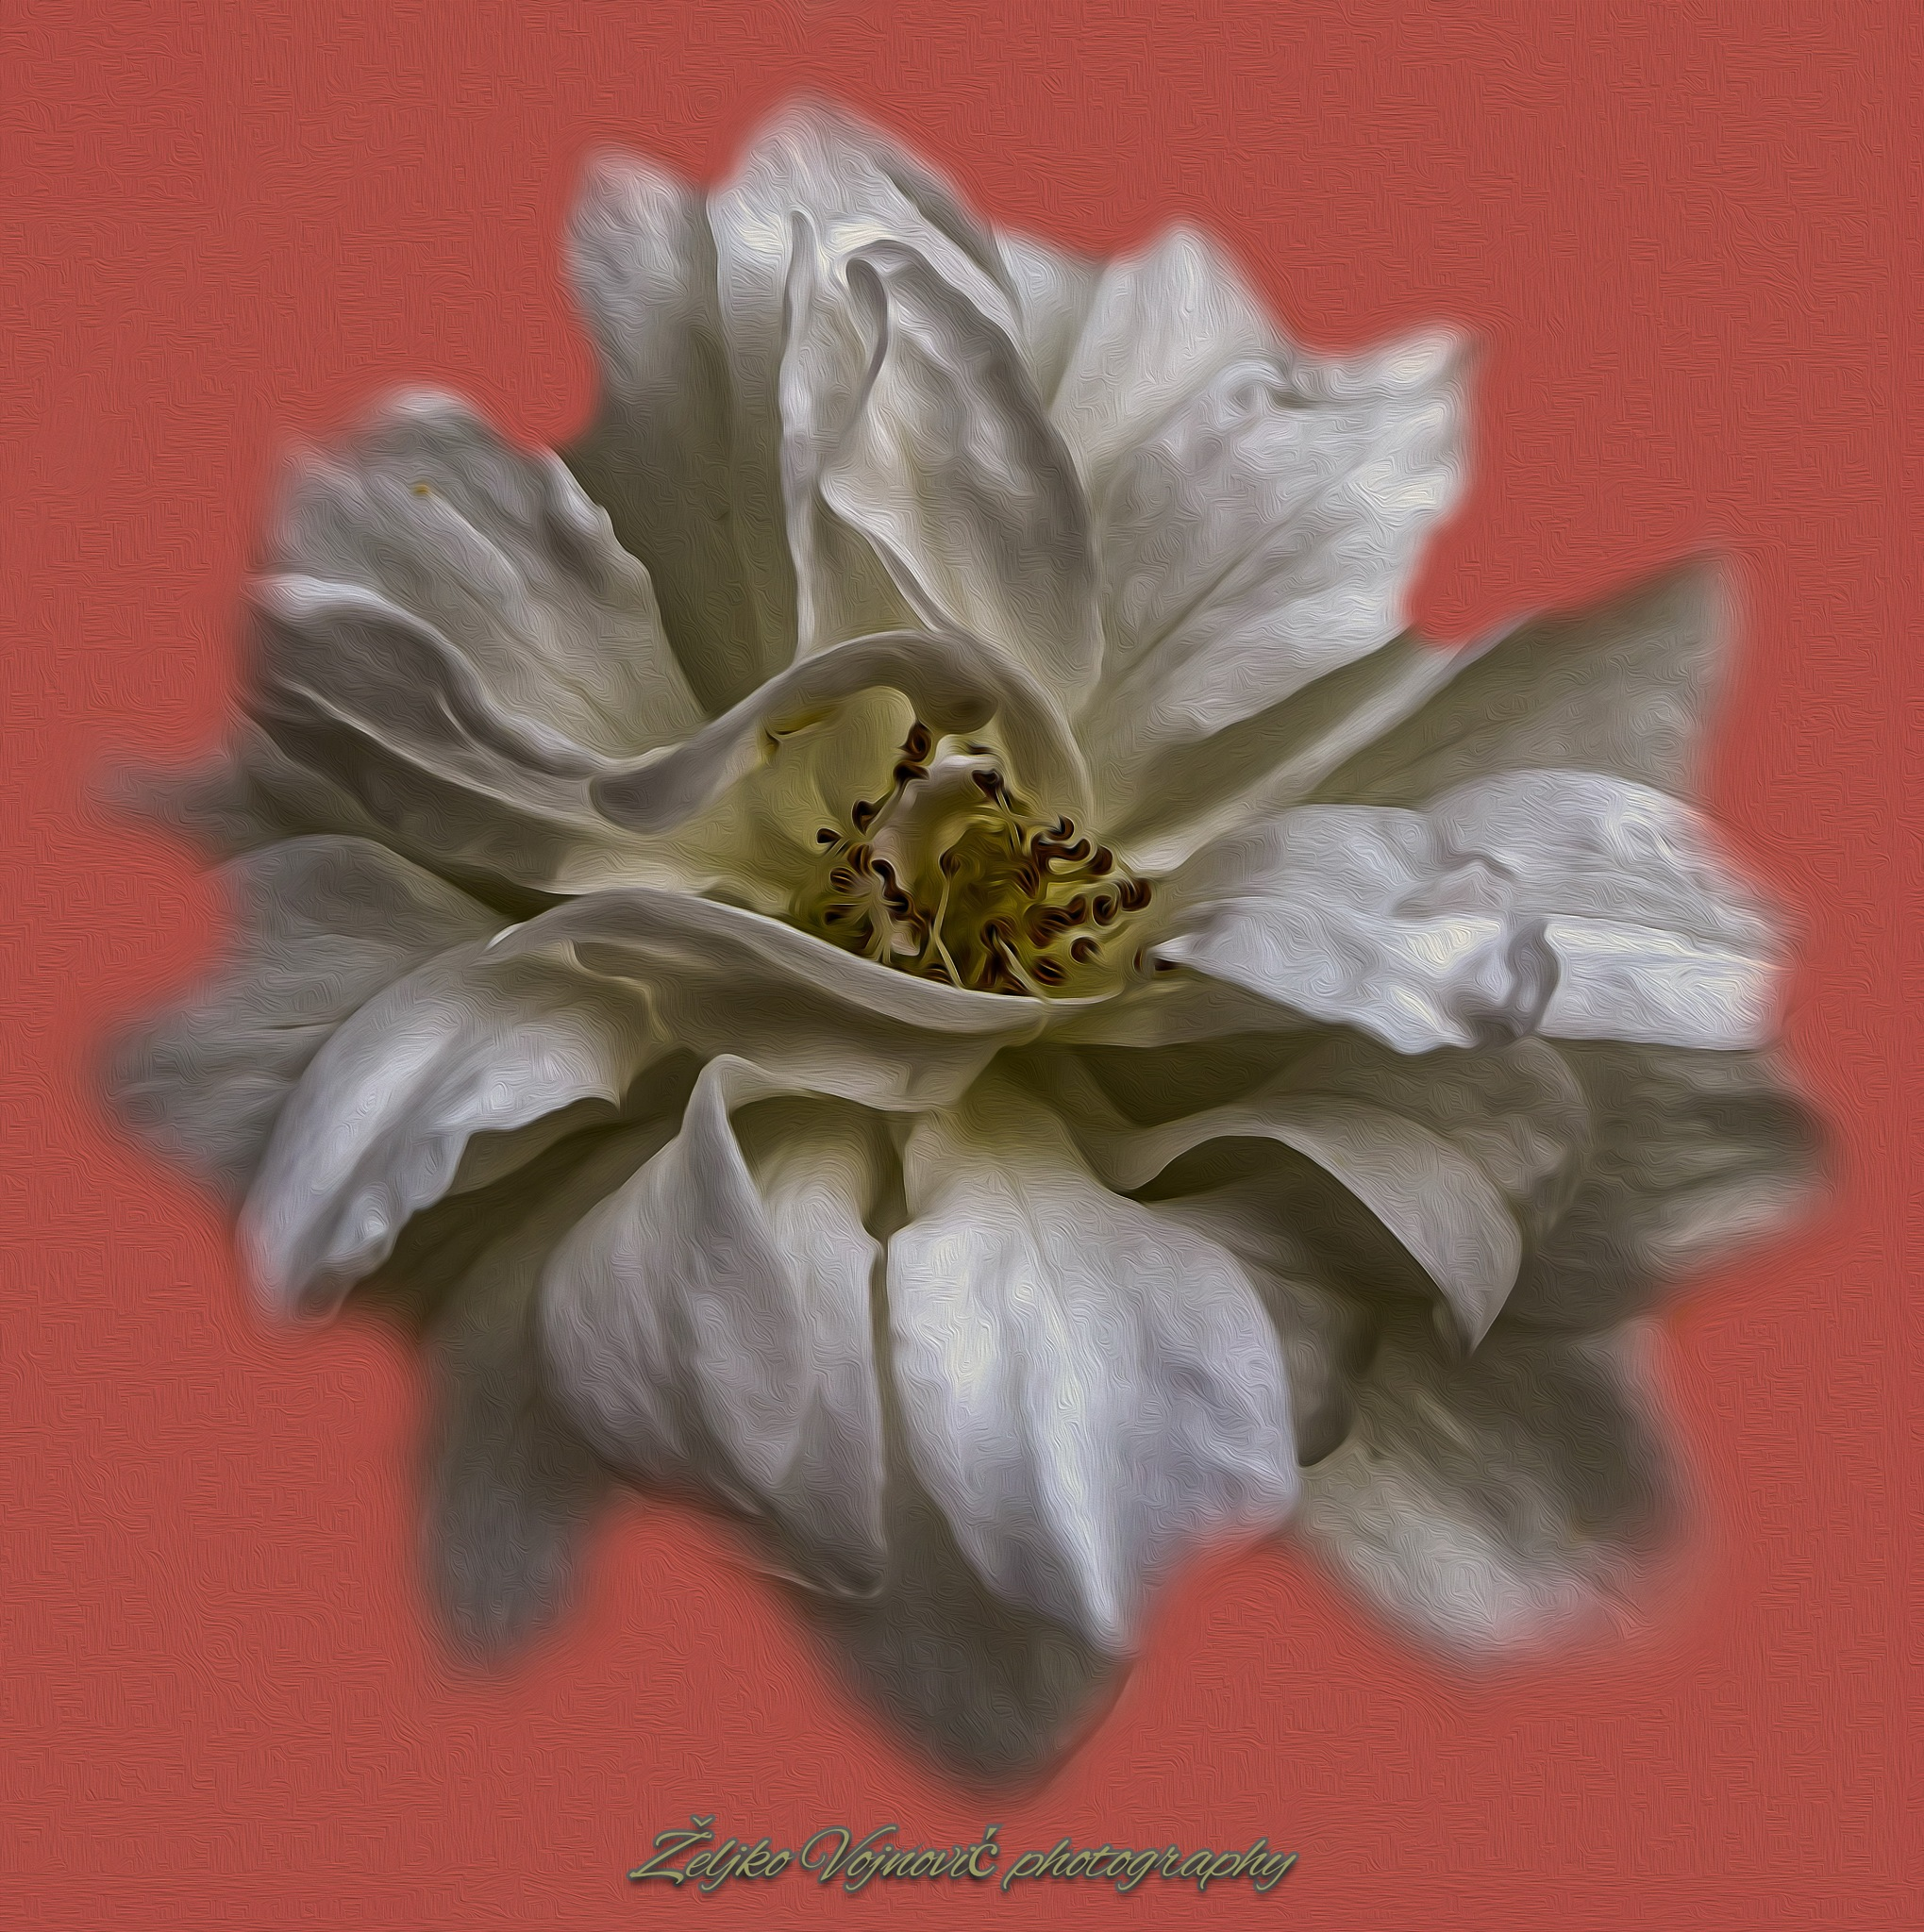 Rose by Željko Vojnović